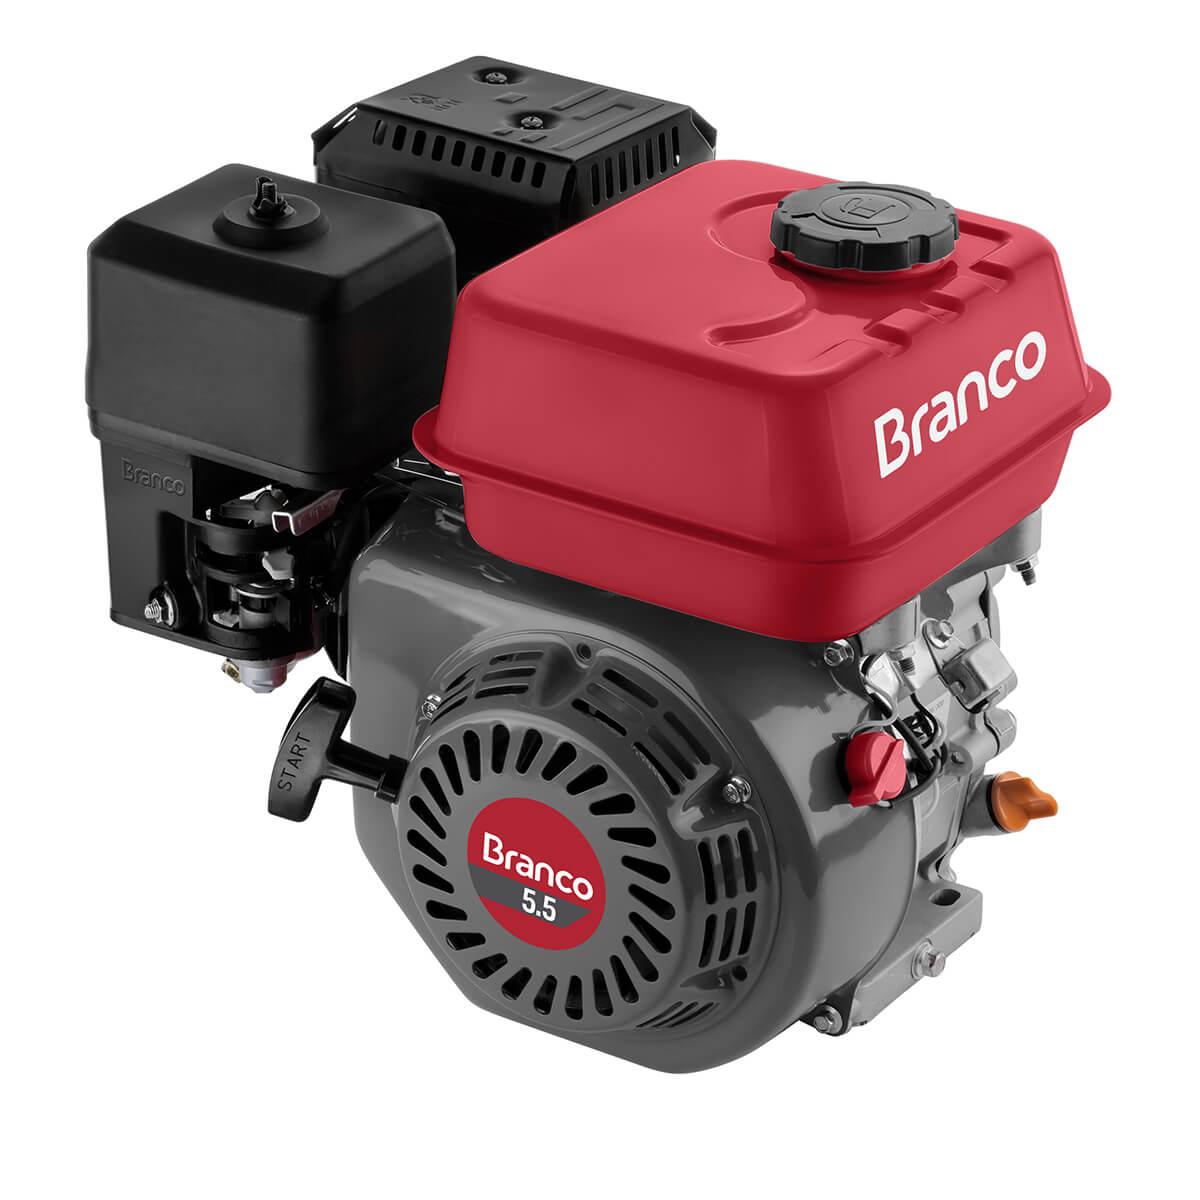 MOTOR BRANCO 5,5HP B4T COM ALERTA DE OLEO - 90500262